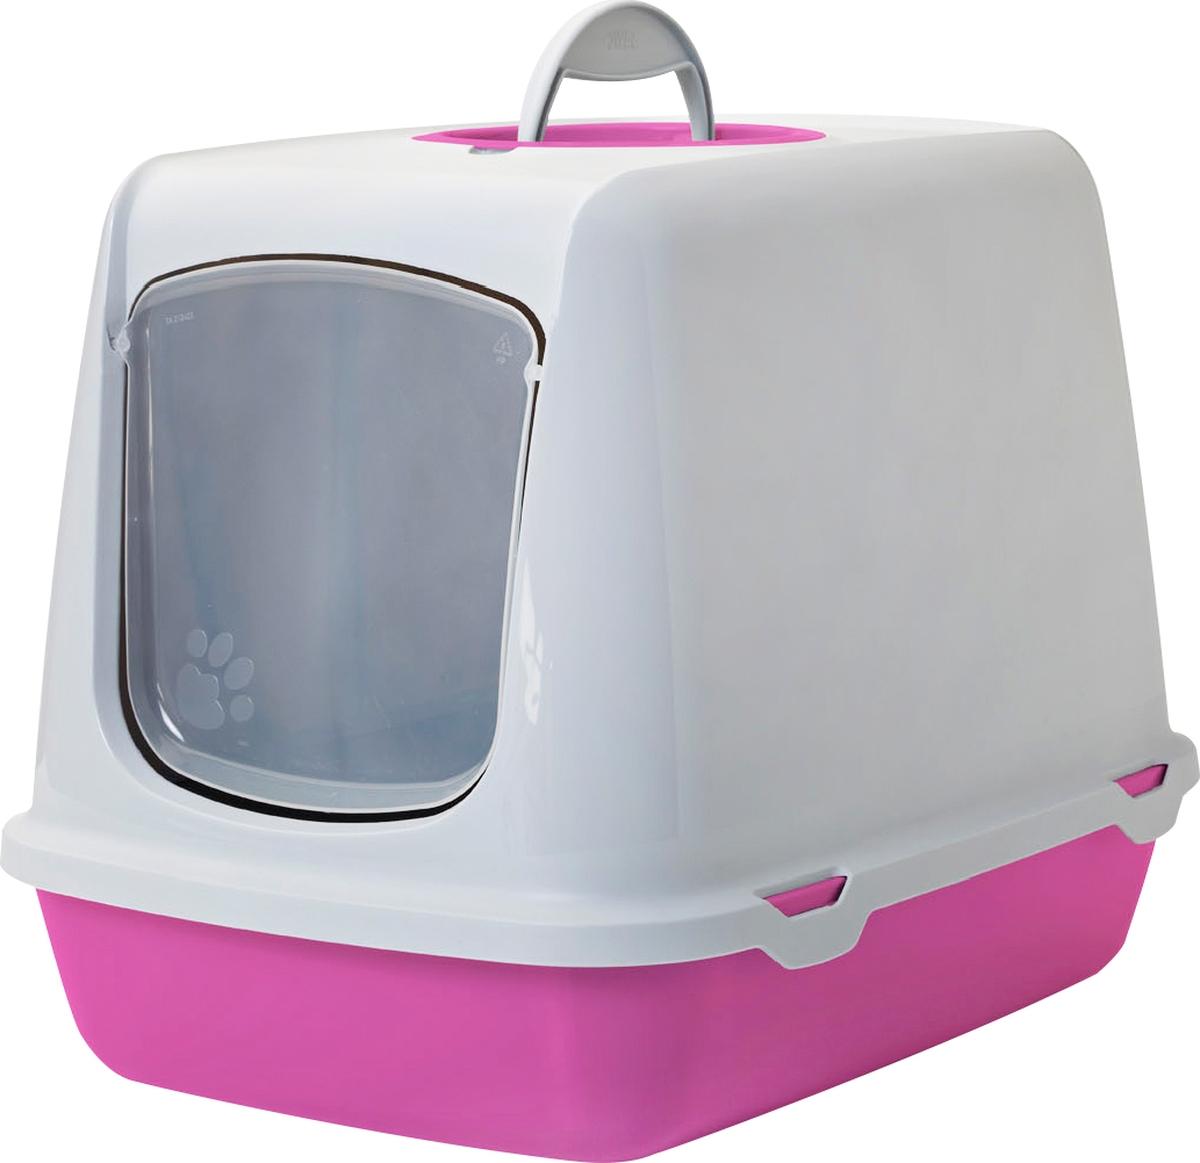 Туалет для кошек Savic Oscar, цвет: белый, розовый, 50 х 37 х 13,9 см туалет для кошек curver pet life закрытый цвет кремово коричневый 51 х 39 х 40 см